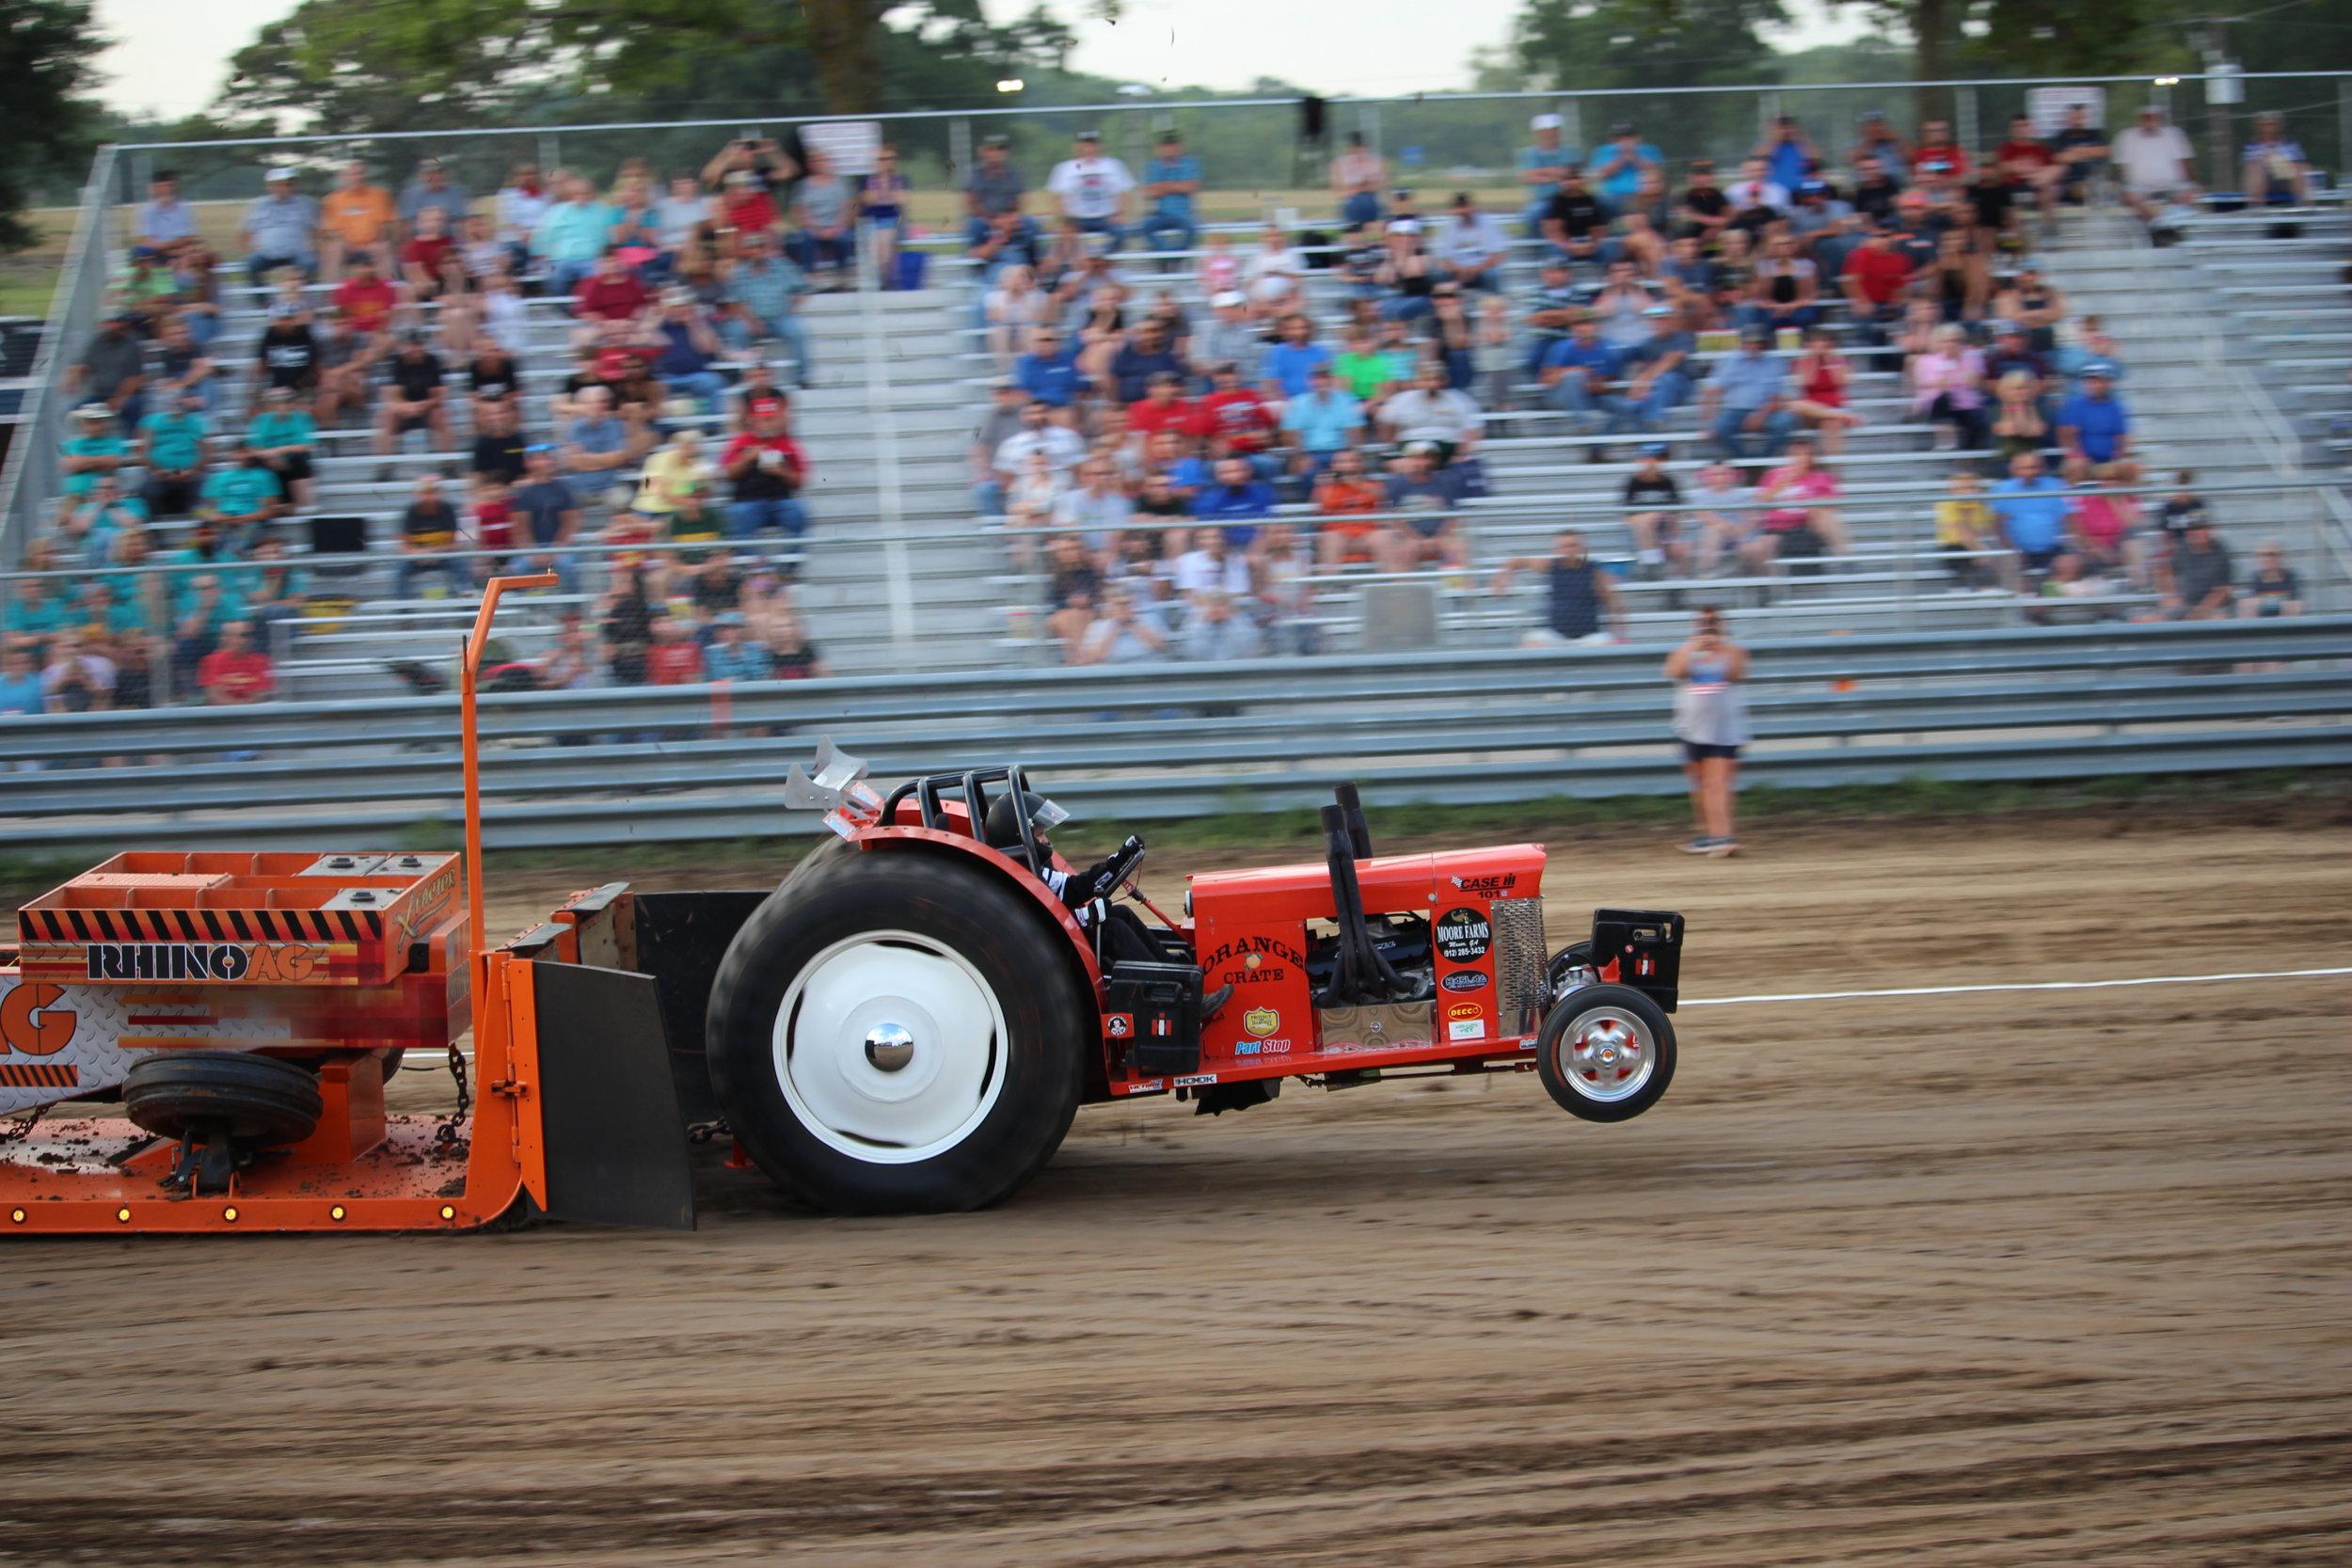 tractor pull 3.JPG